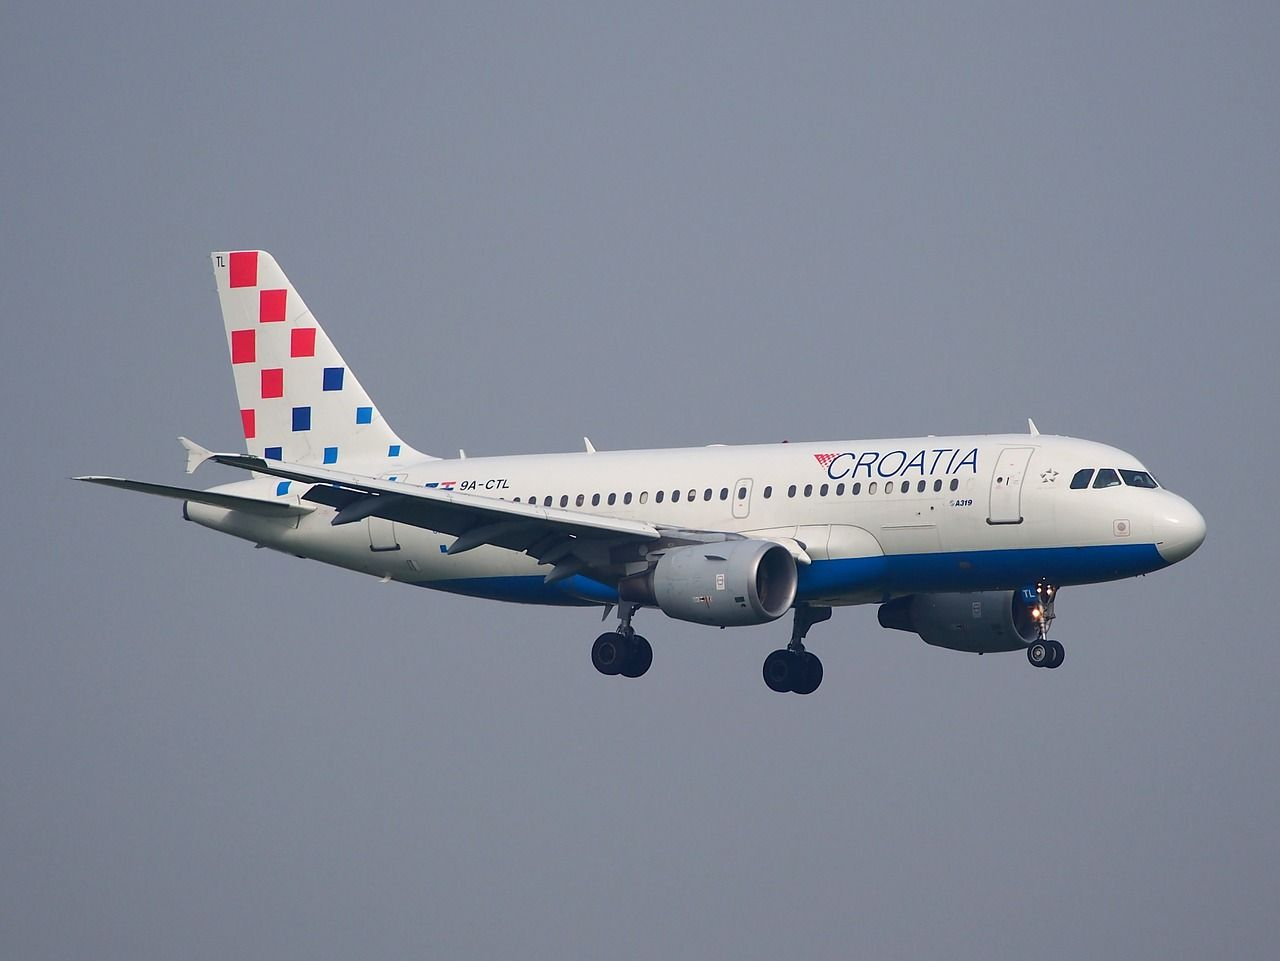 Travel Ctl Landing Croatia Airlines Airplane Jet Travel Ctl Landing Croatia Airlines Airplane Jet Croatia Travel Croatia Travel